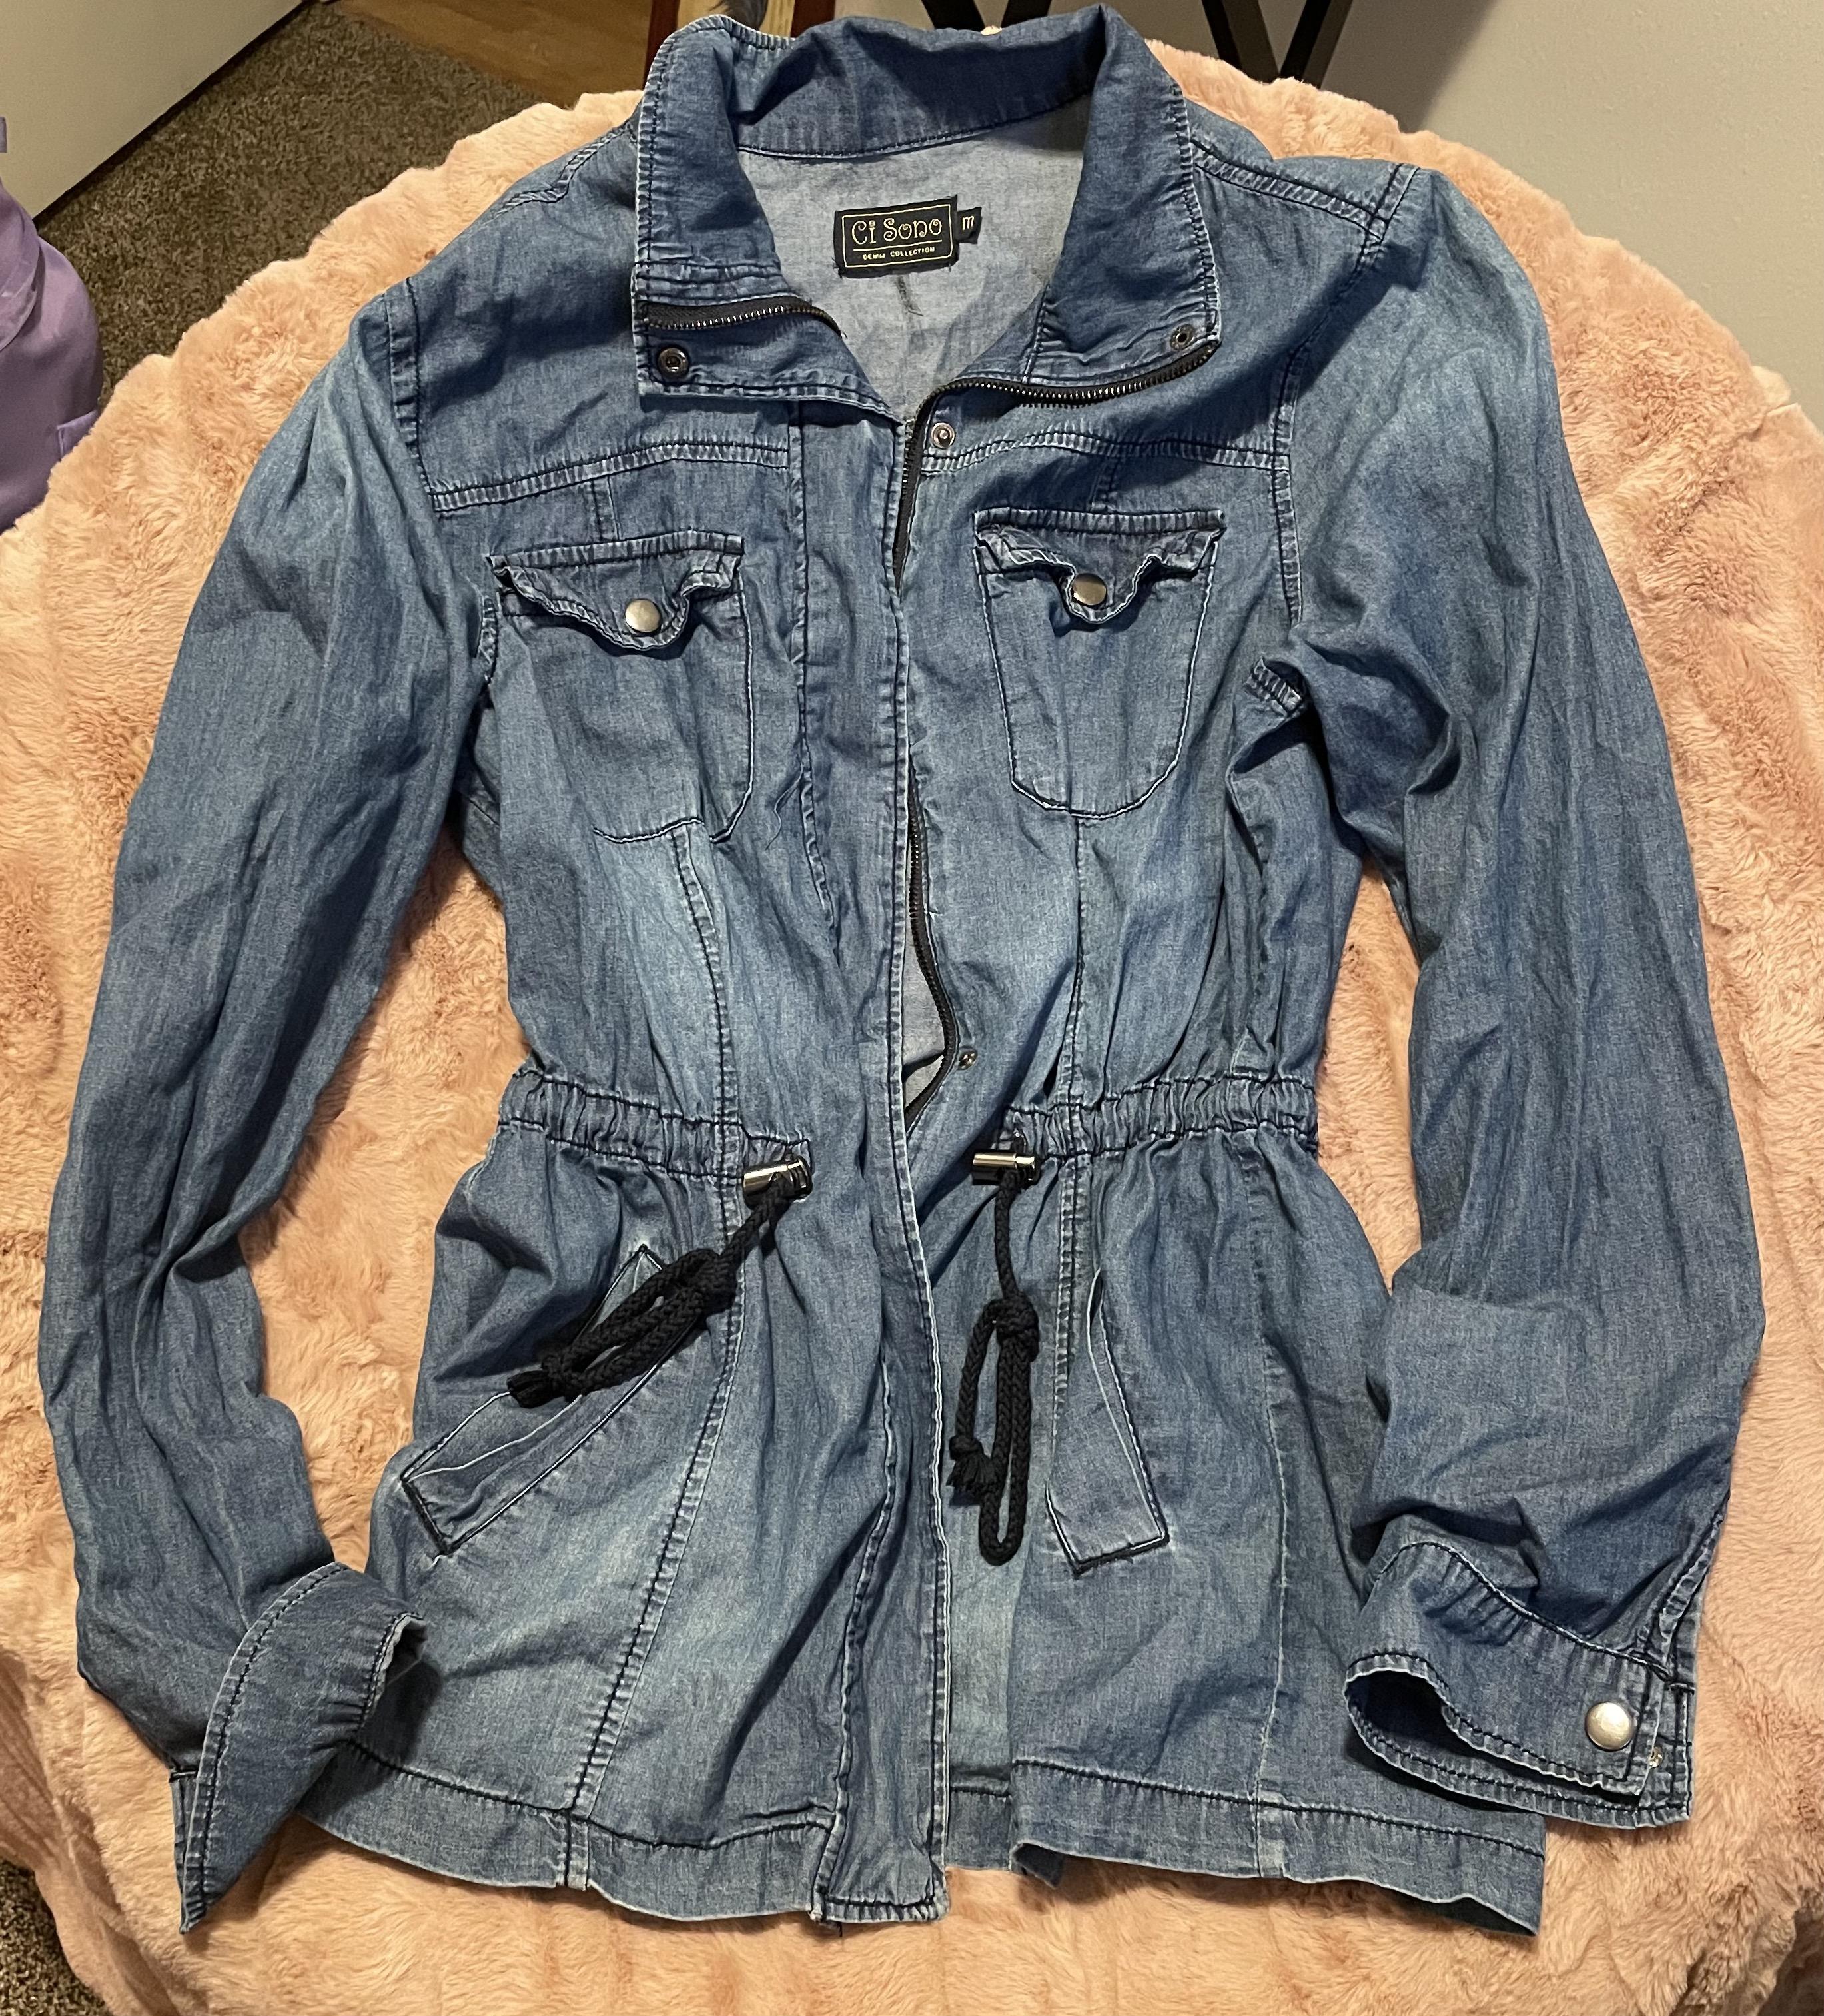 Ci Sono Denim Shacket   Zip Up Medium Wash Jean Jacket   Sinched Tied Adjustable Waste  Women's Medium Long Sleeve Shirt